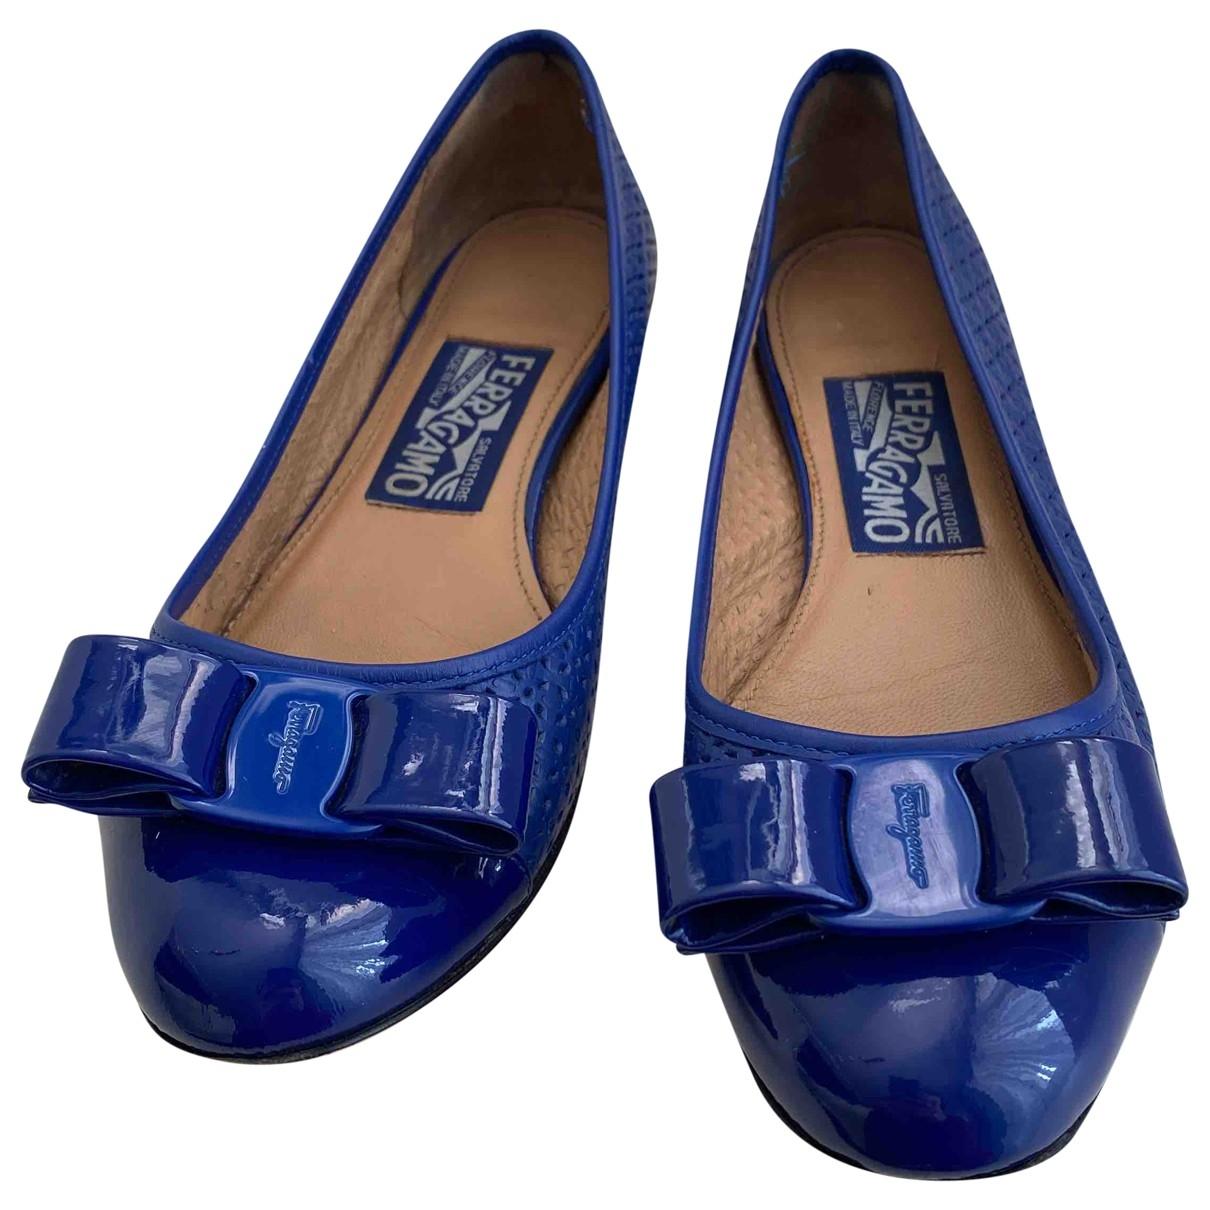 Salvatore Ferragamo Vara Grey Patent leather Ballet flats for Women 5 US